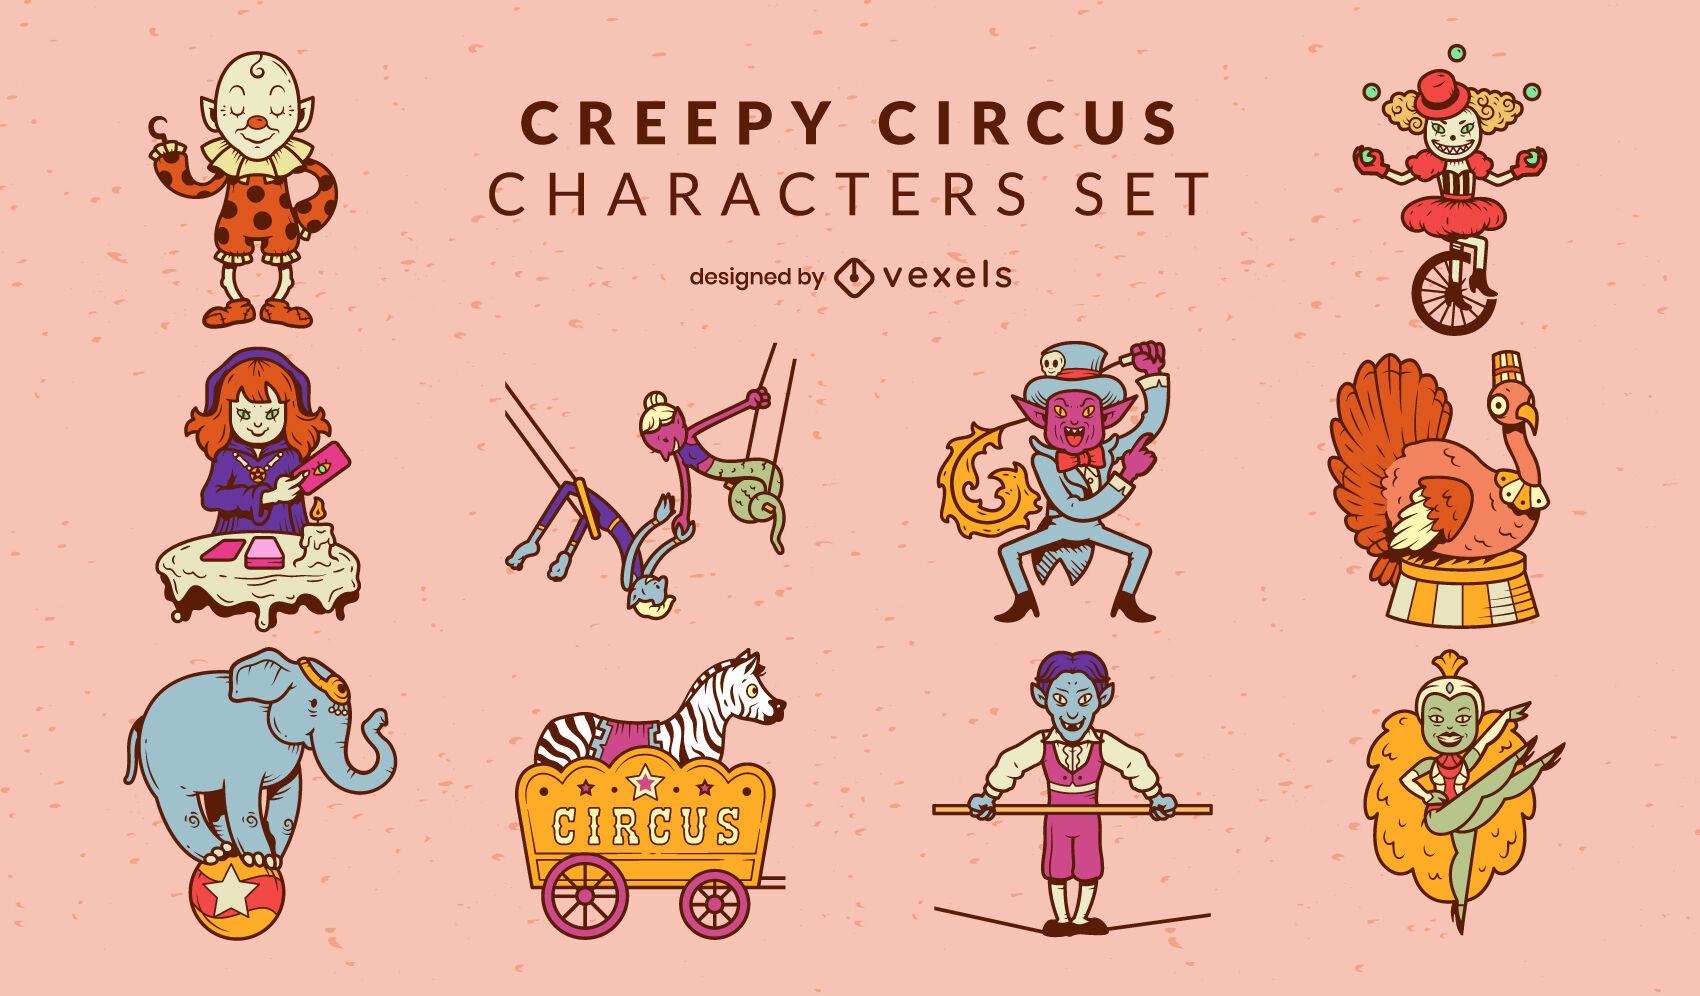 Circus performers creepy characters set